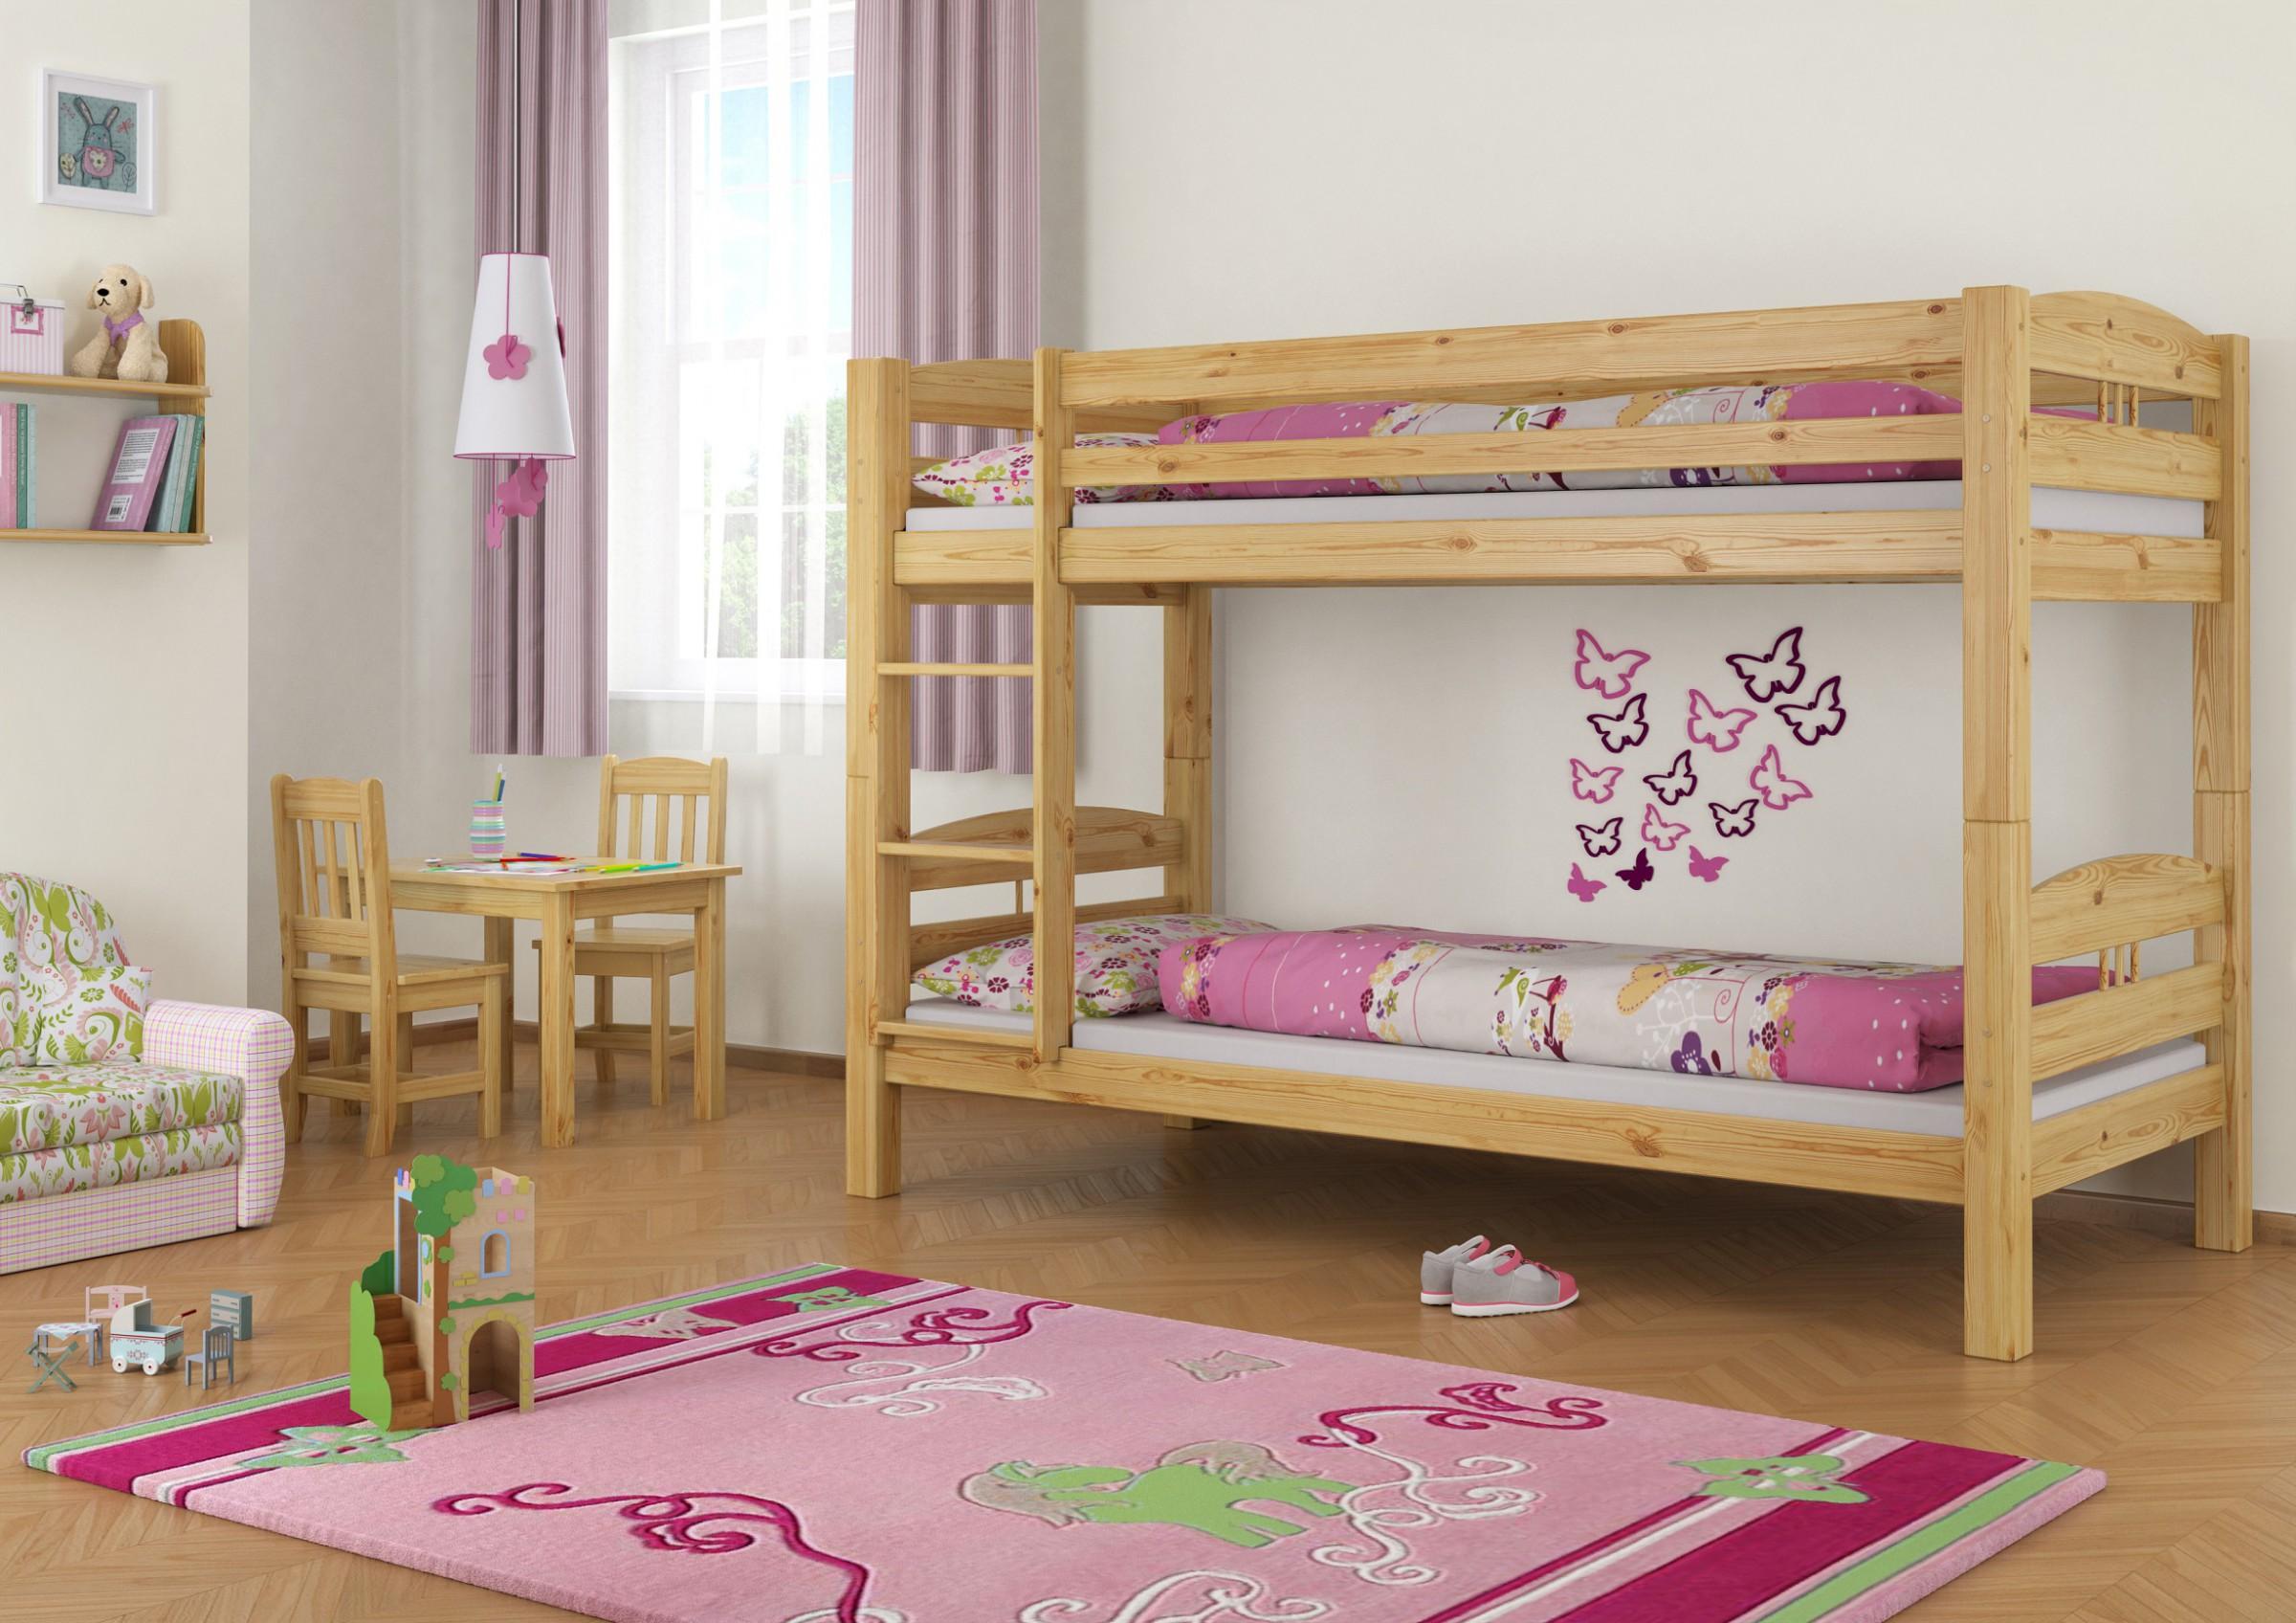 Kinderbett etagenbett holzbett stockbett kiefer 90x200 mit for Kinderzimmer komplett mit etagenbett